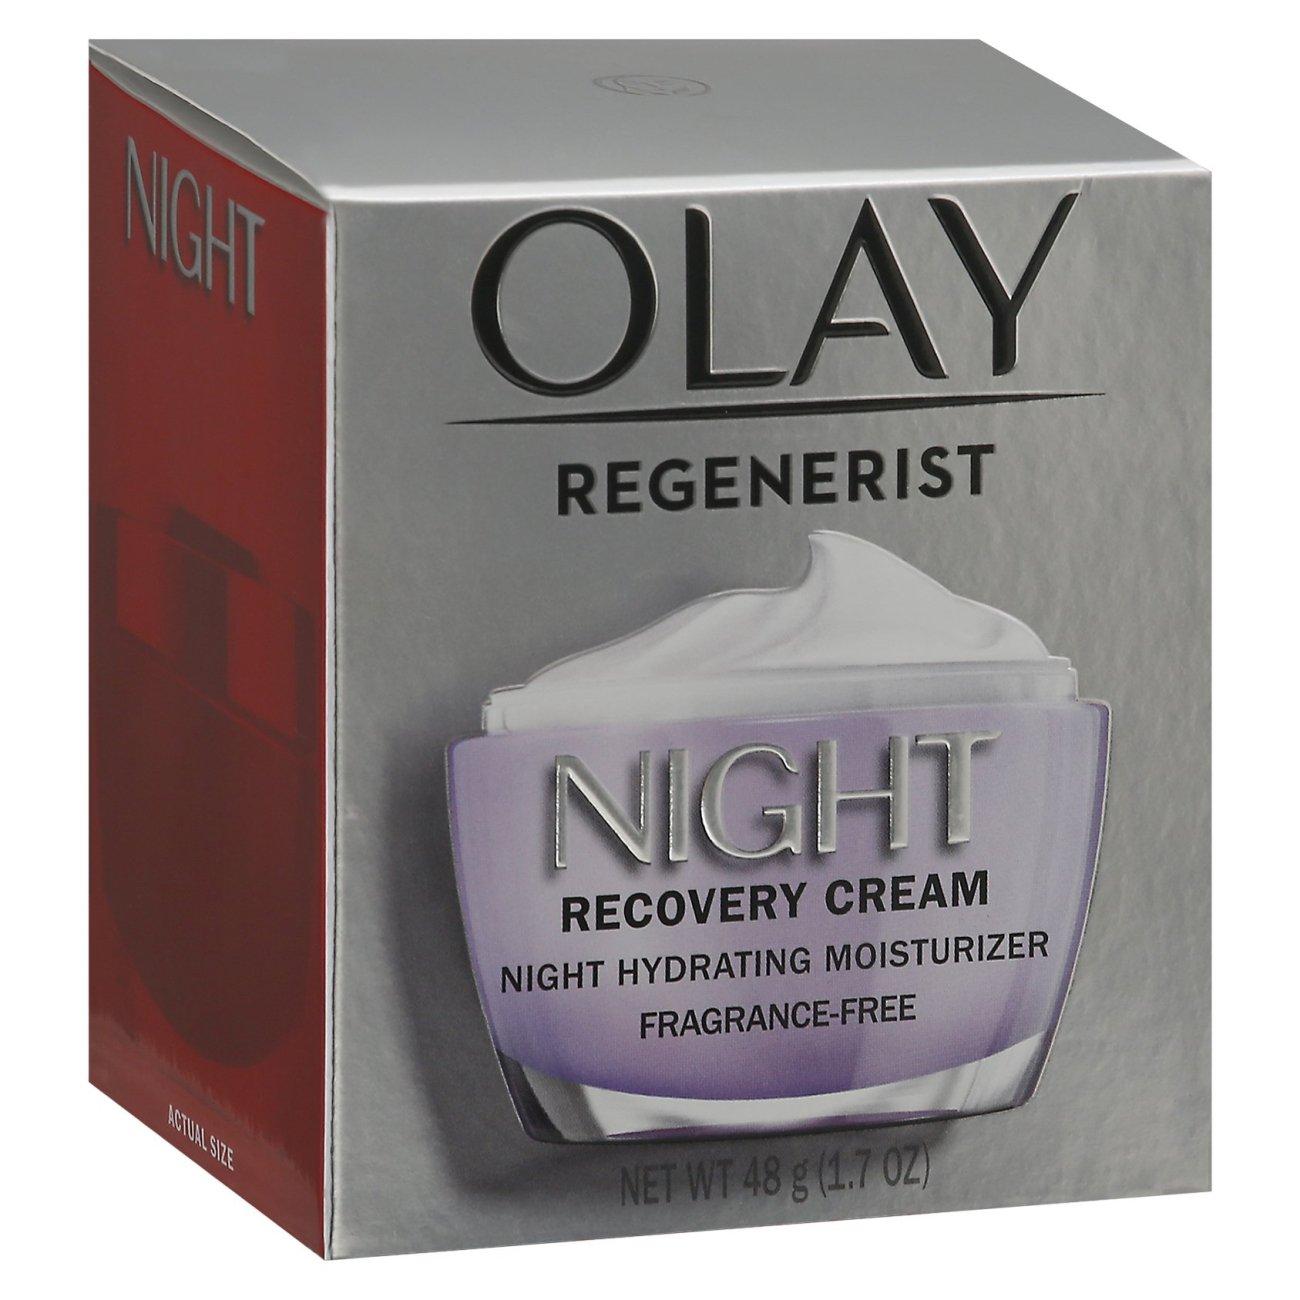 Olay Regenerist Night Recovery Advanced Anti-Aging Fragrance-Free Facial Cream - Shop